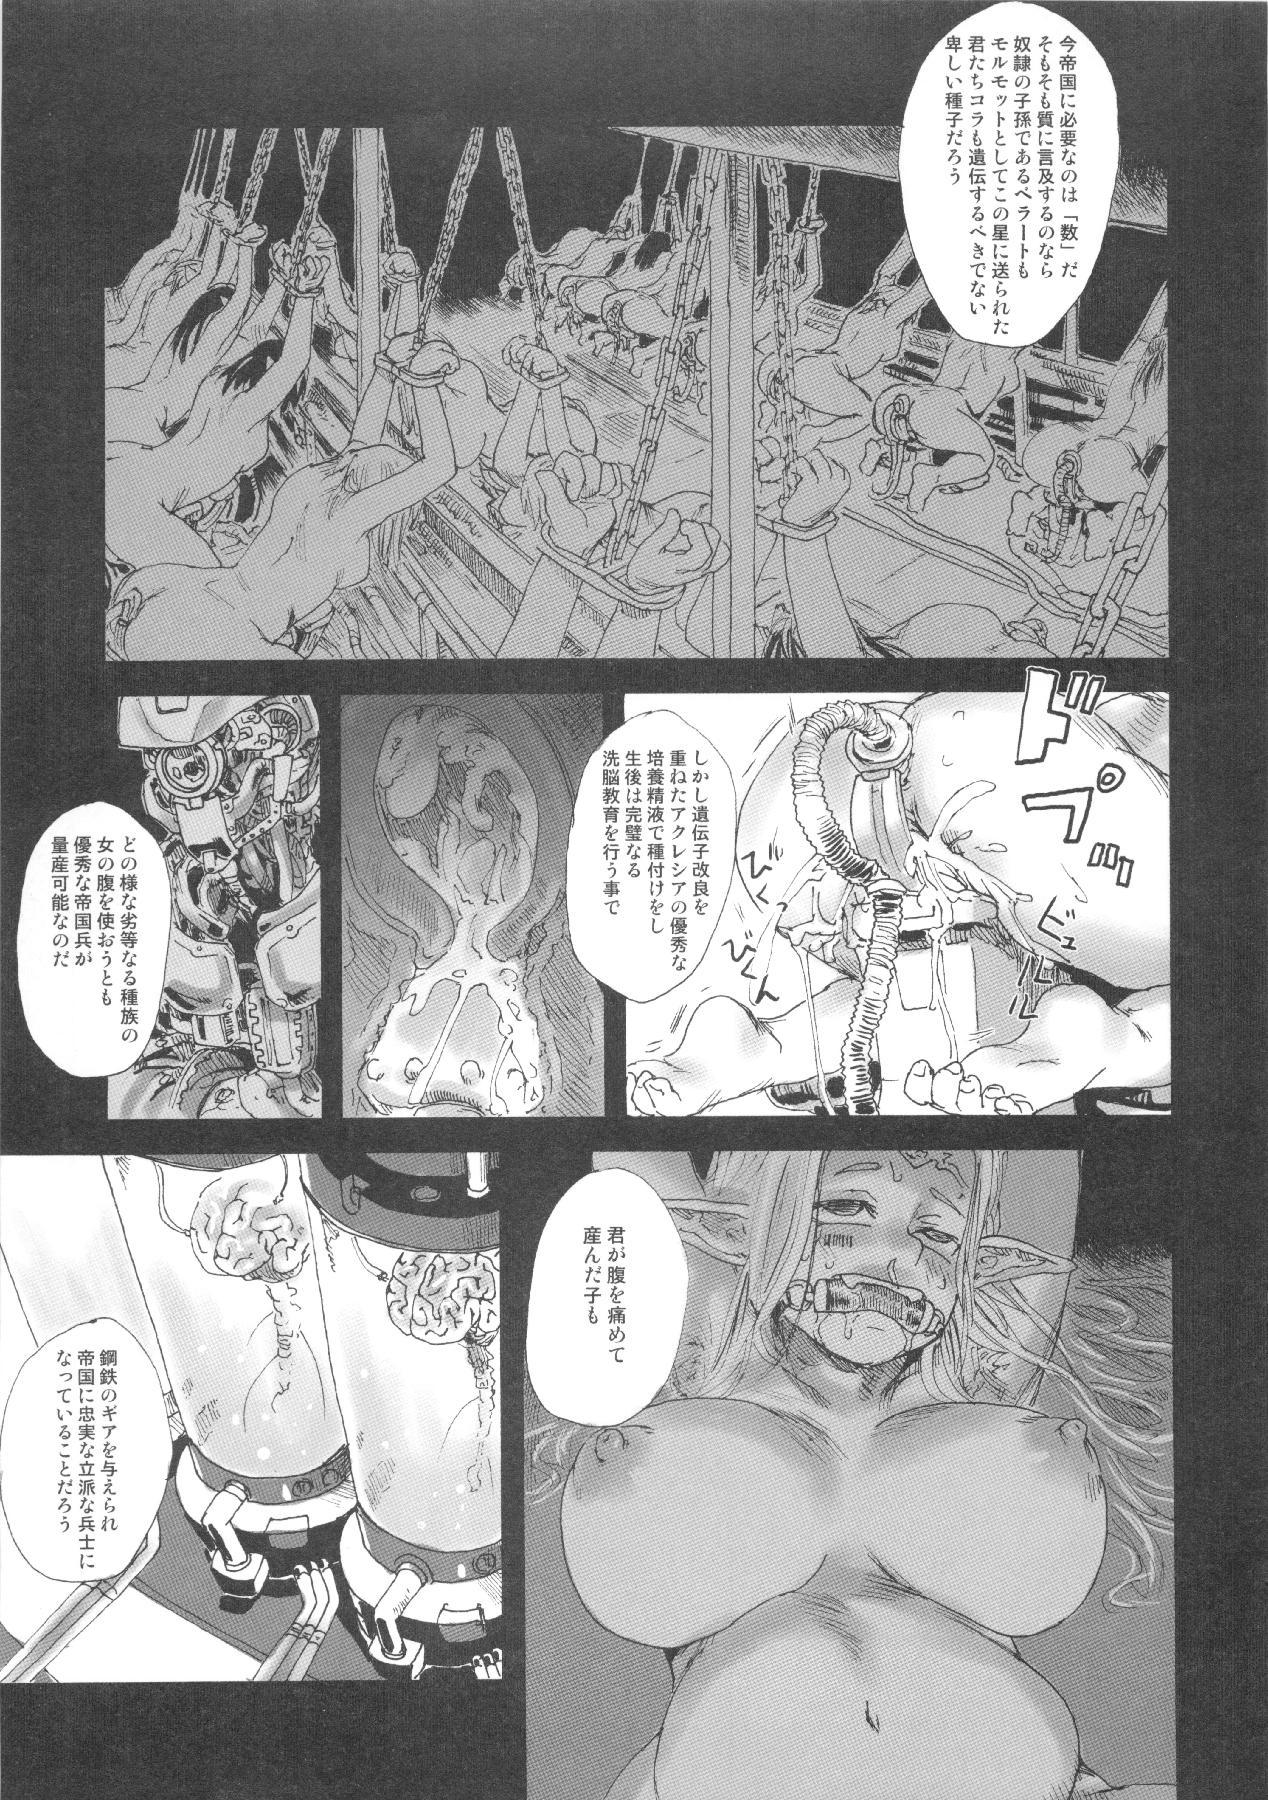 (C83) [Fatalpulse (Asanagi)] VictimGirls Compiled Vol.1 -Victimgirls Soushuuhen 1- MMO Game Selection (Various) 109